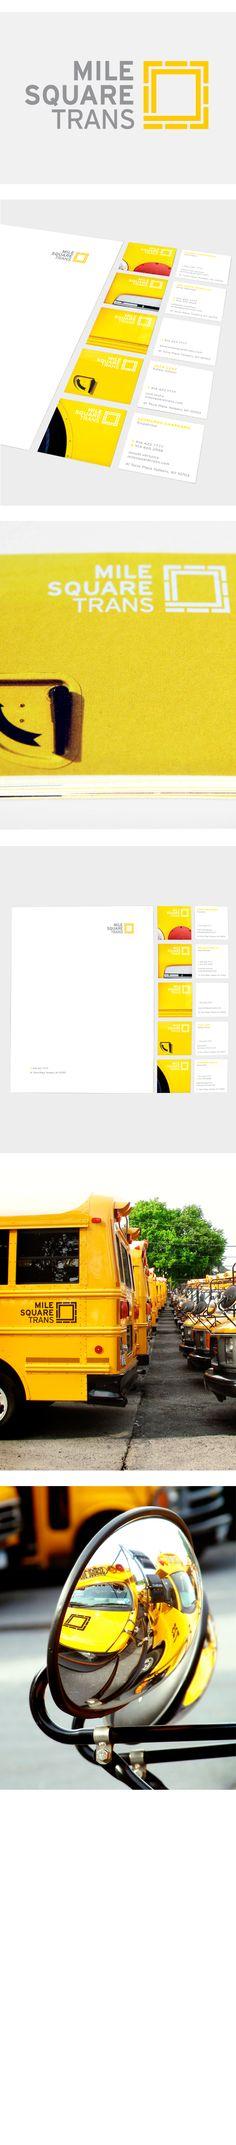 Mile Square by Juan Carlos Pagan, via Behance Corporate Identity Design, Brand Identity Design, Graphic Design Branding, Visual Identity, Logo Branding, Logos, Logo Design, Construction Branding, Square Logo